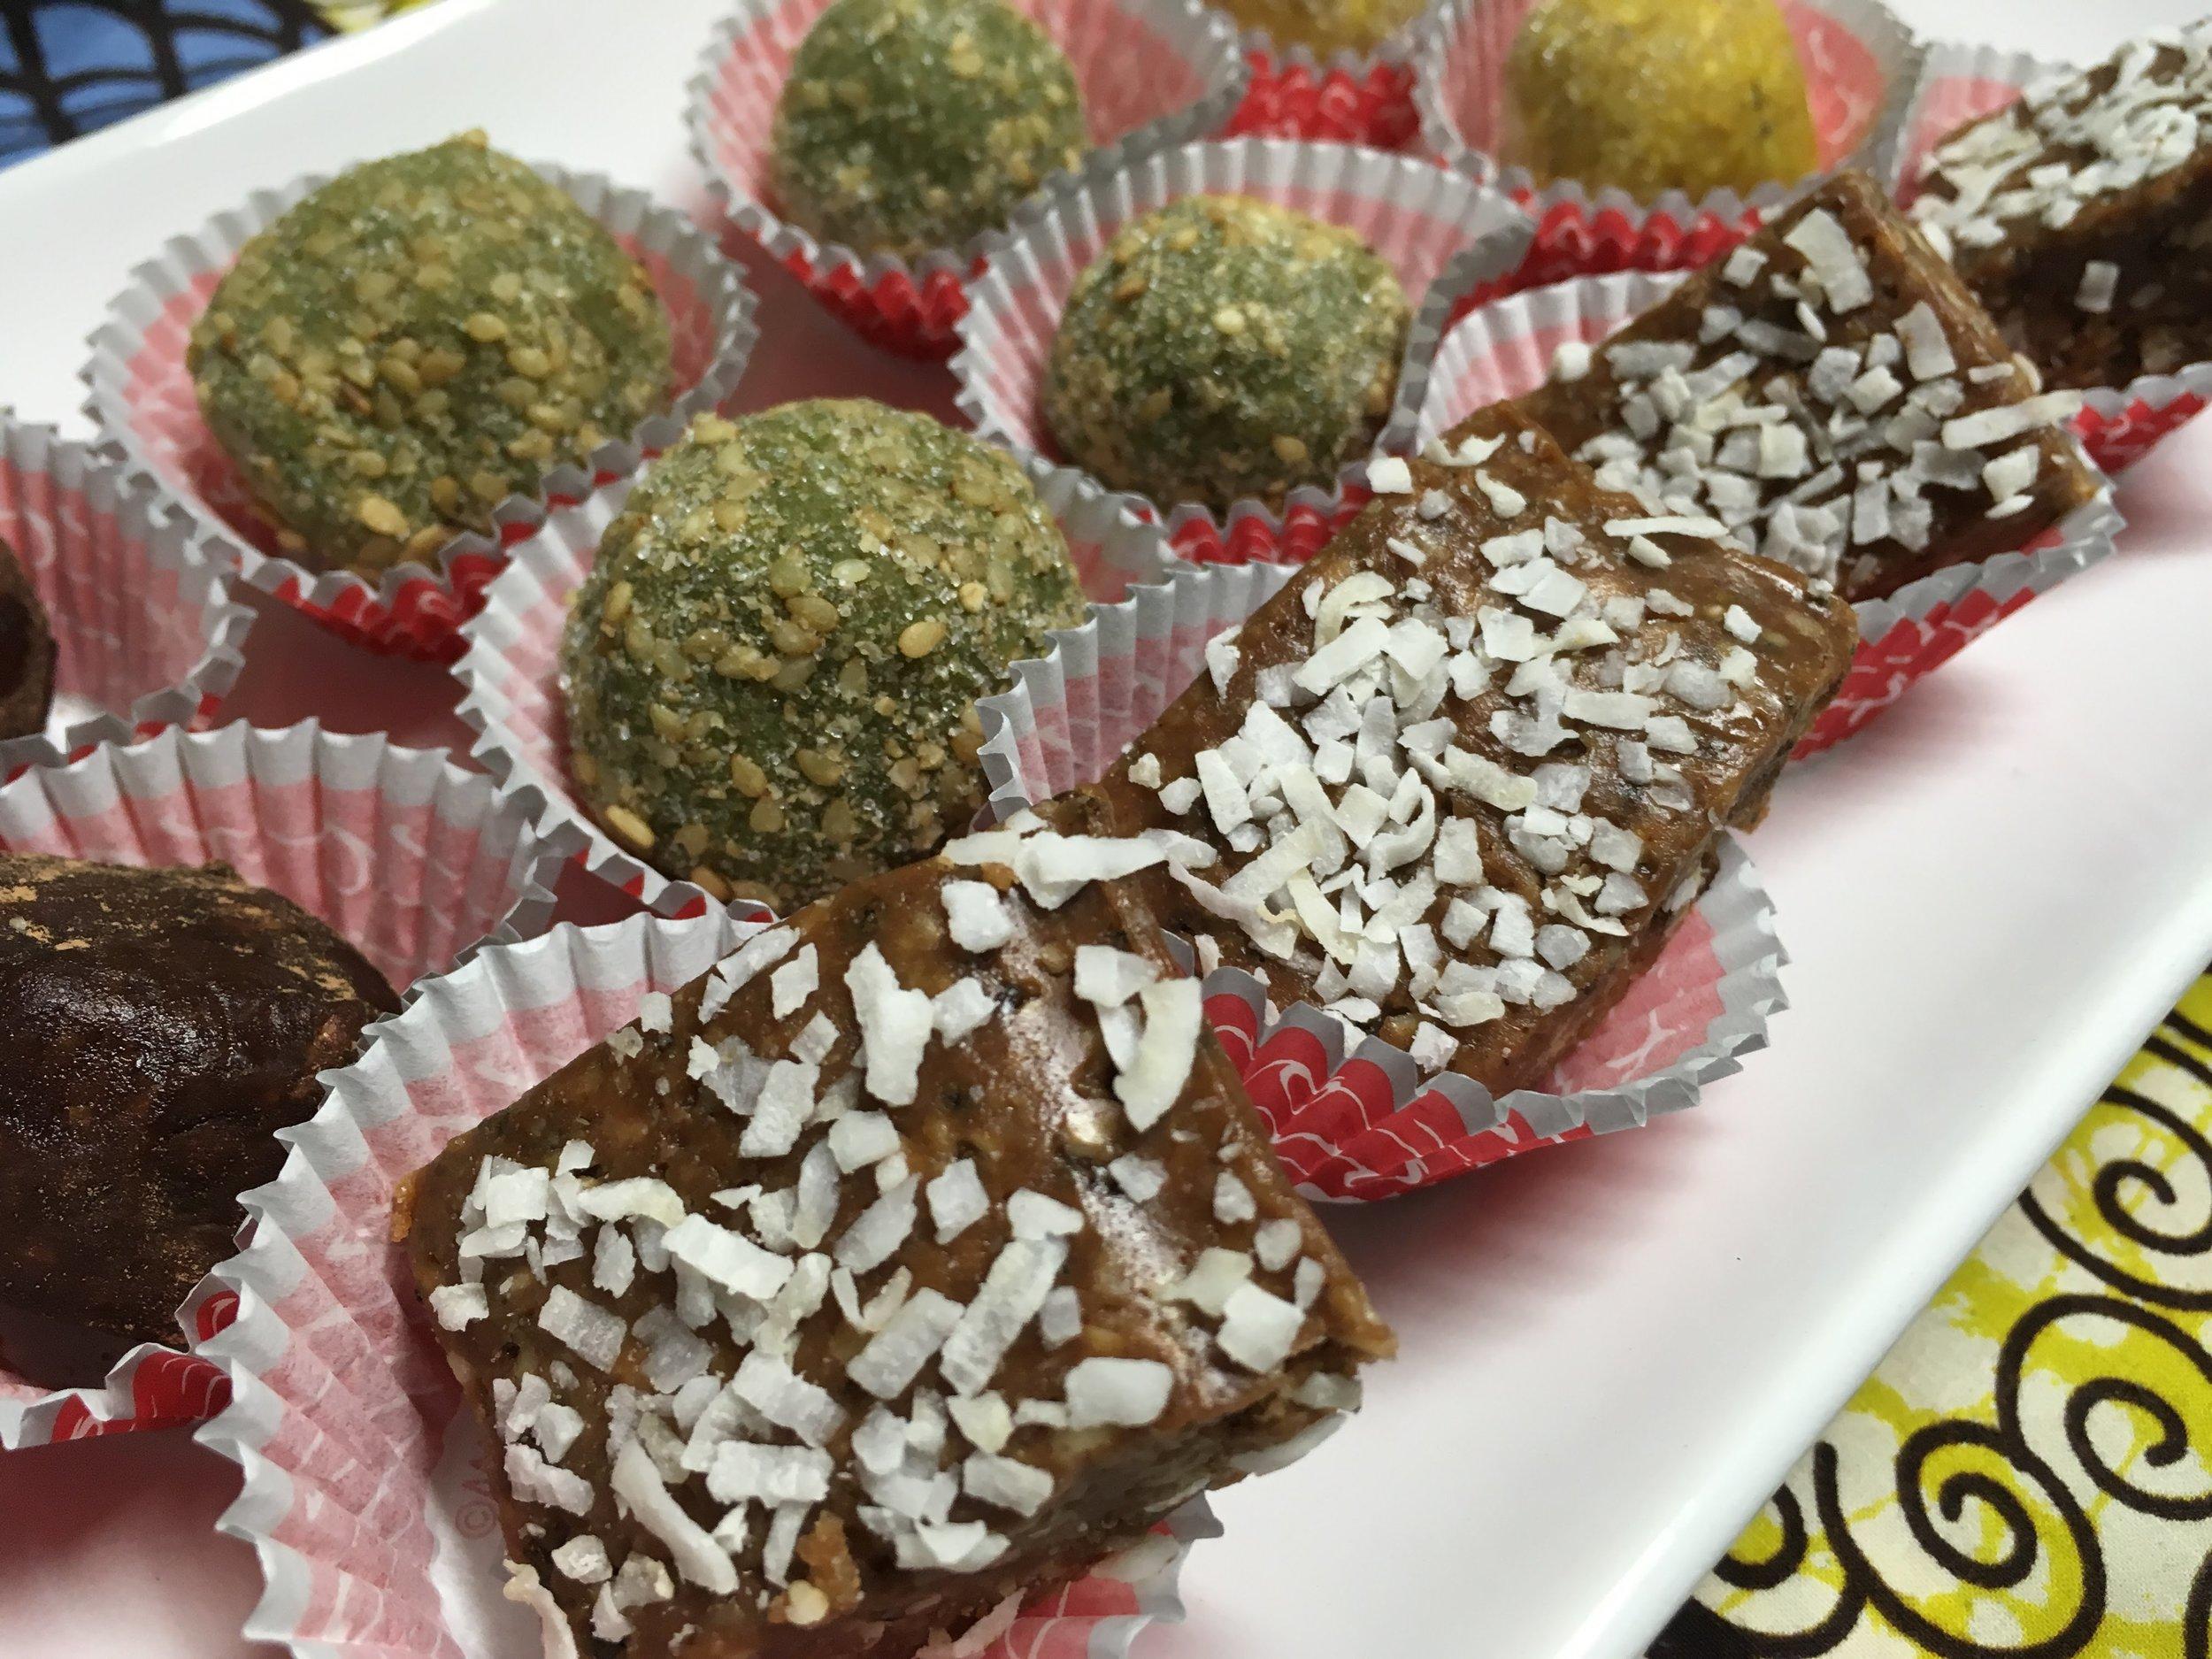 Lemon Blueberry Lavender, Matcha, Chocolate Raspberry Hazlenut, Chocolate Peanut Butter Maca Truffles!